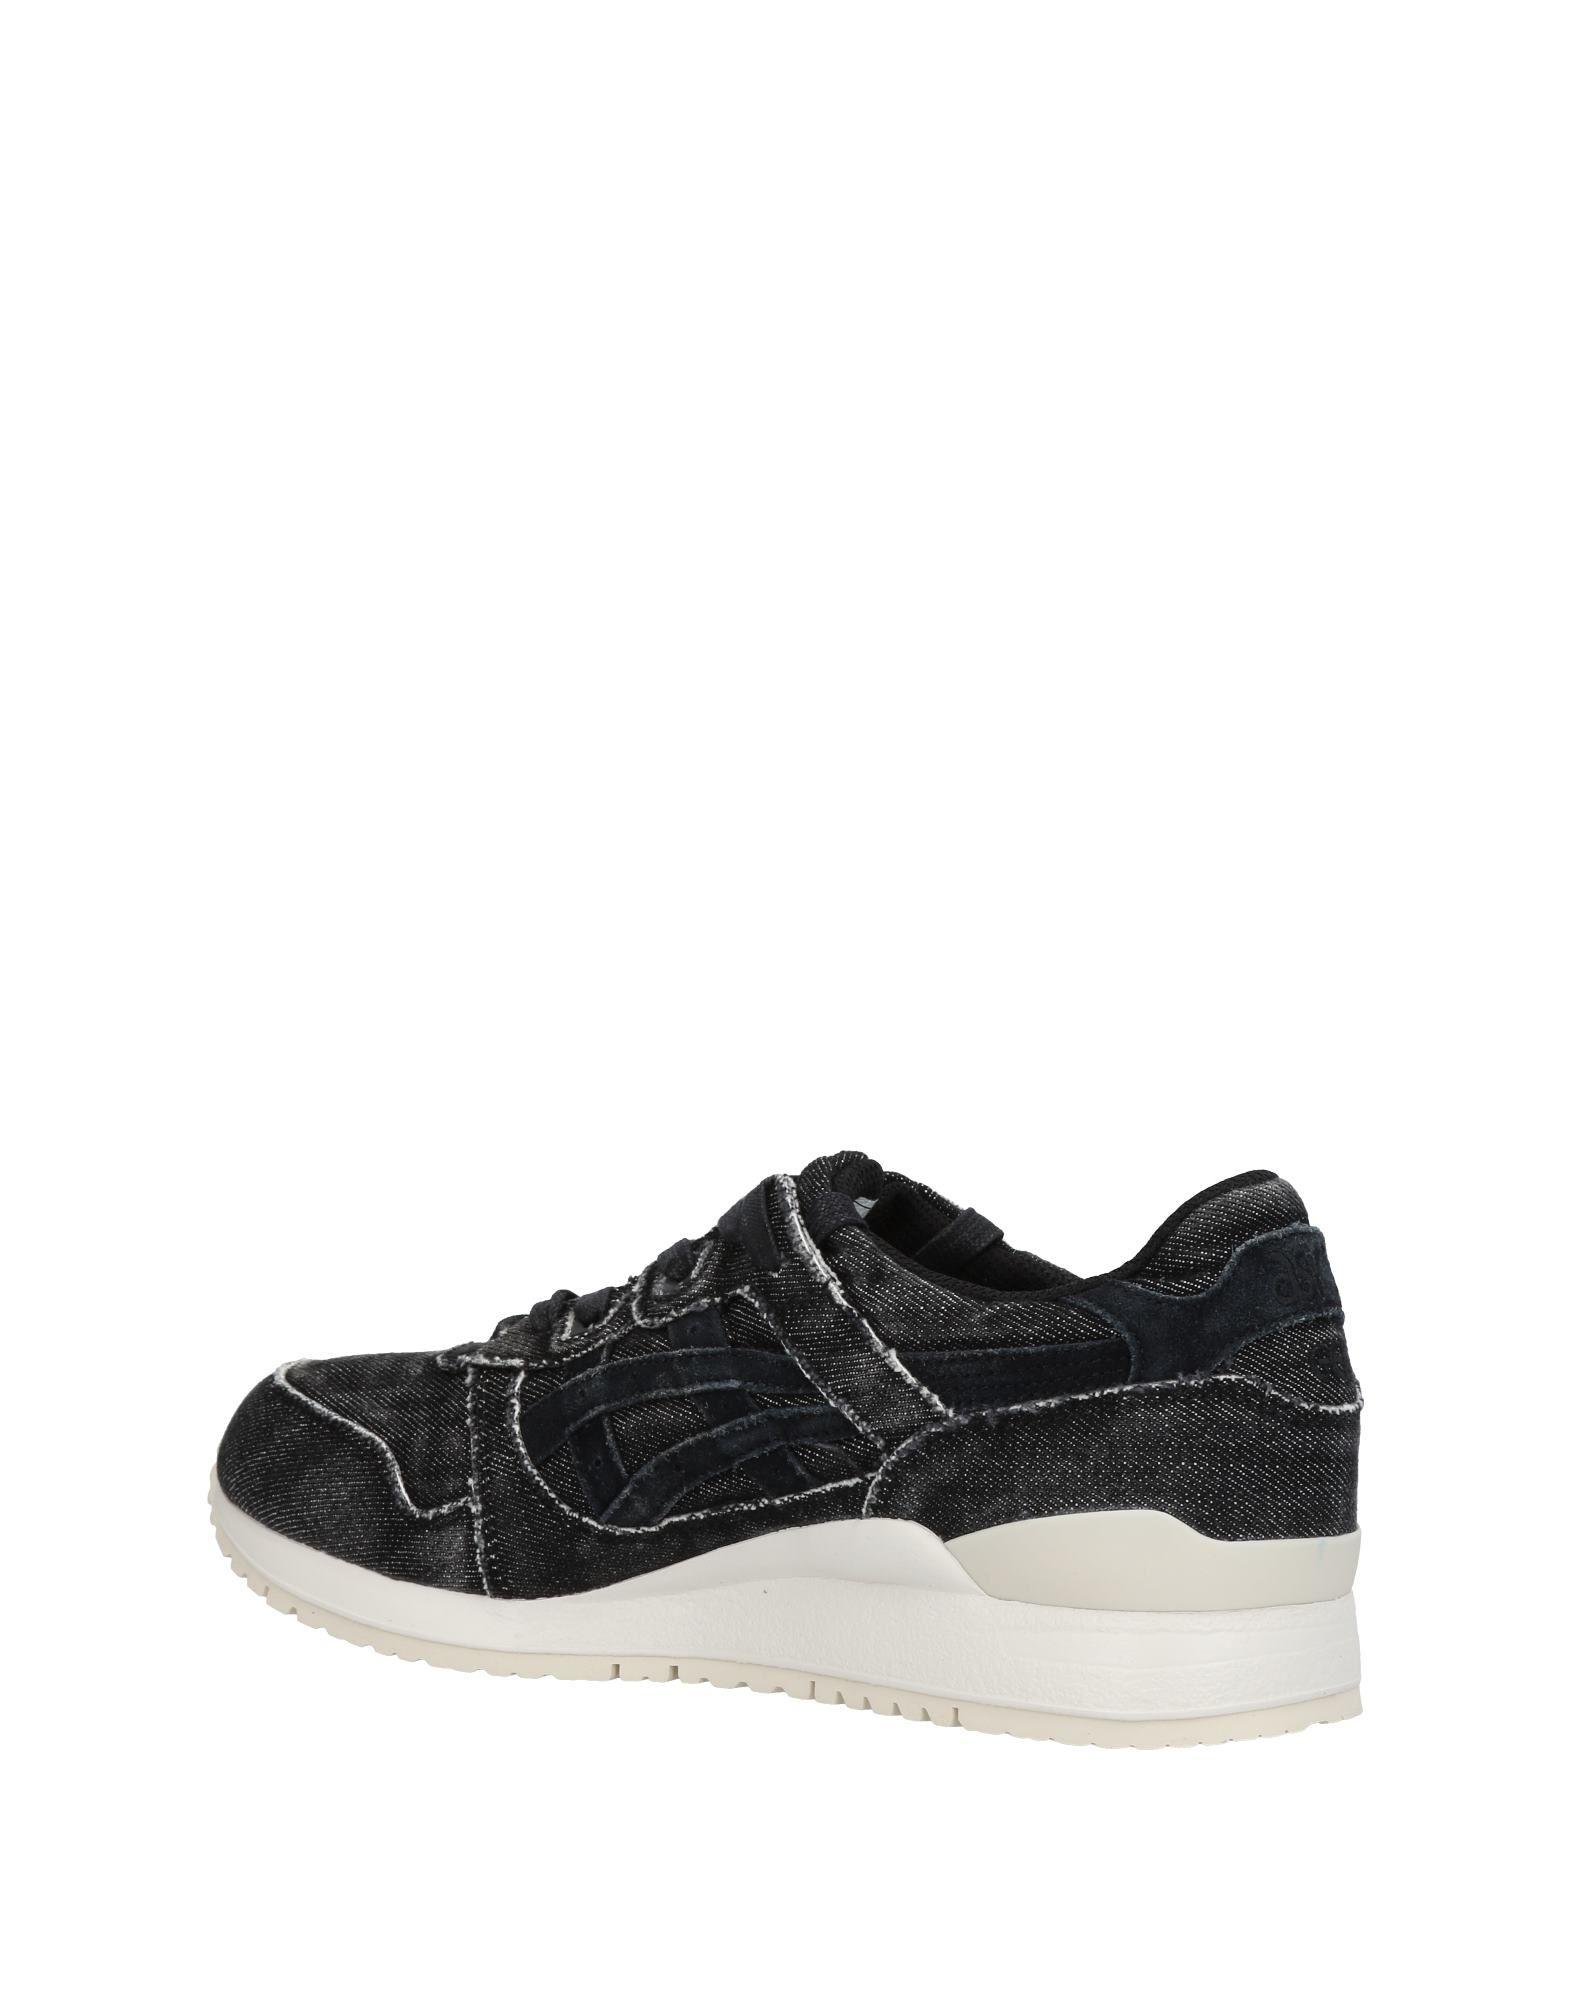 Asics Sneakers Schuhe Herren  11455943DK Heiße Schuhe Sneakers 03ebbf